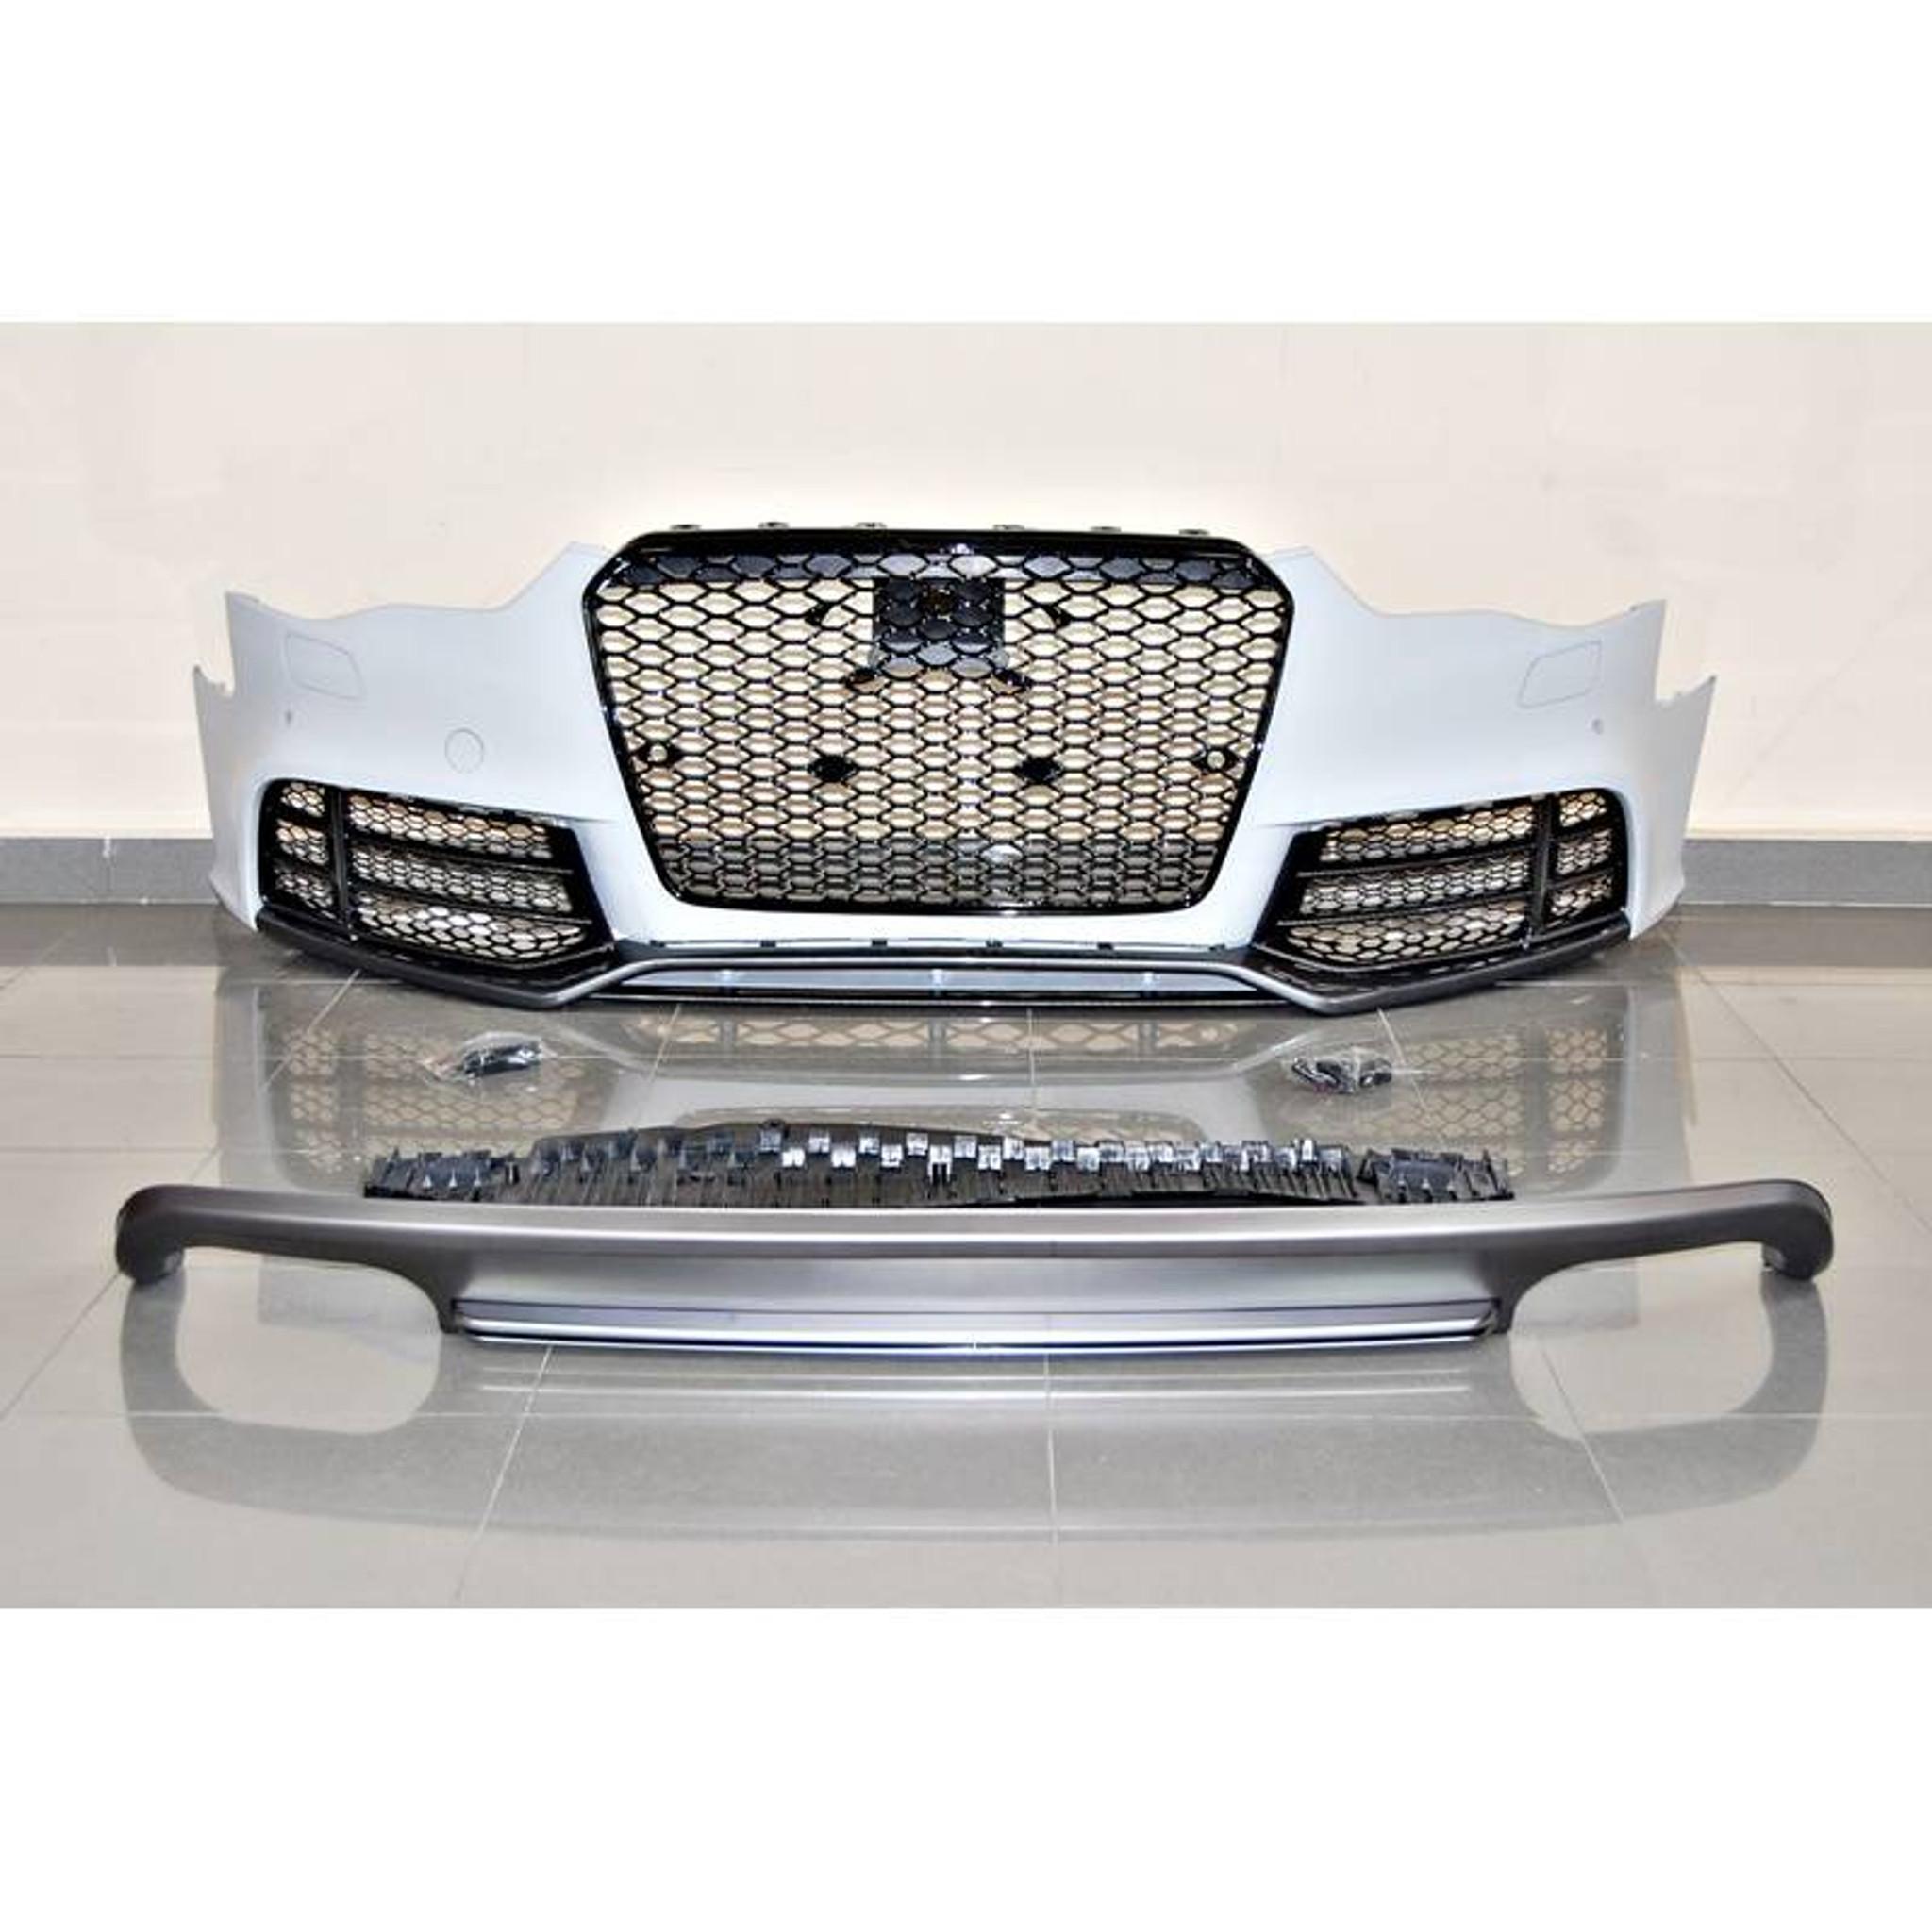 Body Kit Audi A5 Coupe 2012 2015 Look S5 Meduza Design Ltd